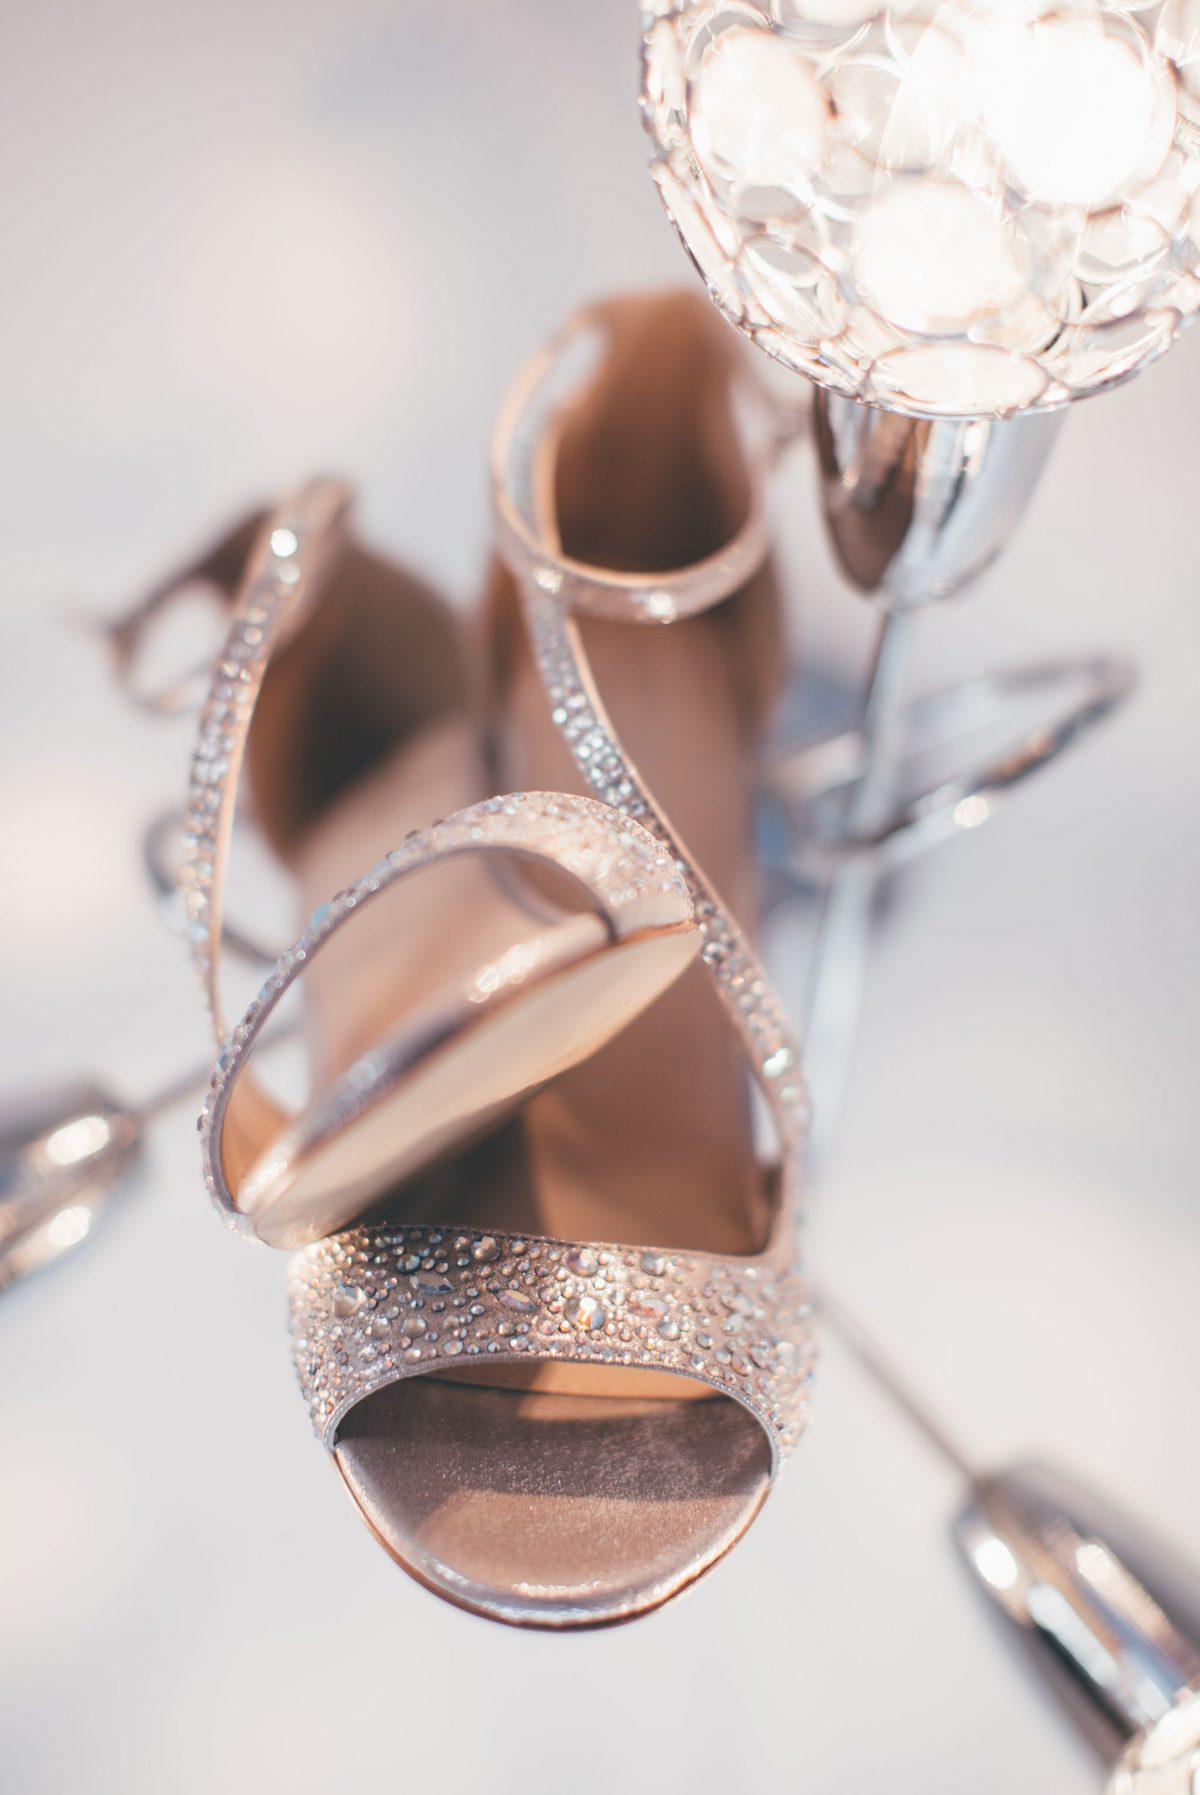 welsh_wedding_photographer_rachel_lambert_photography_decourceys_cardiff_rhiannon_gavin_ 5